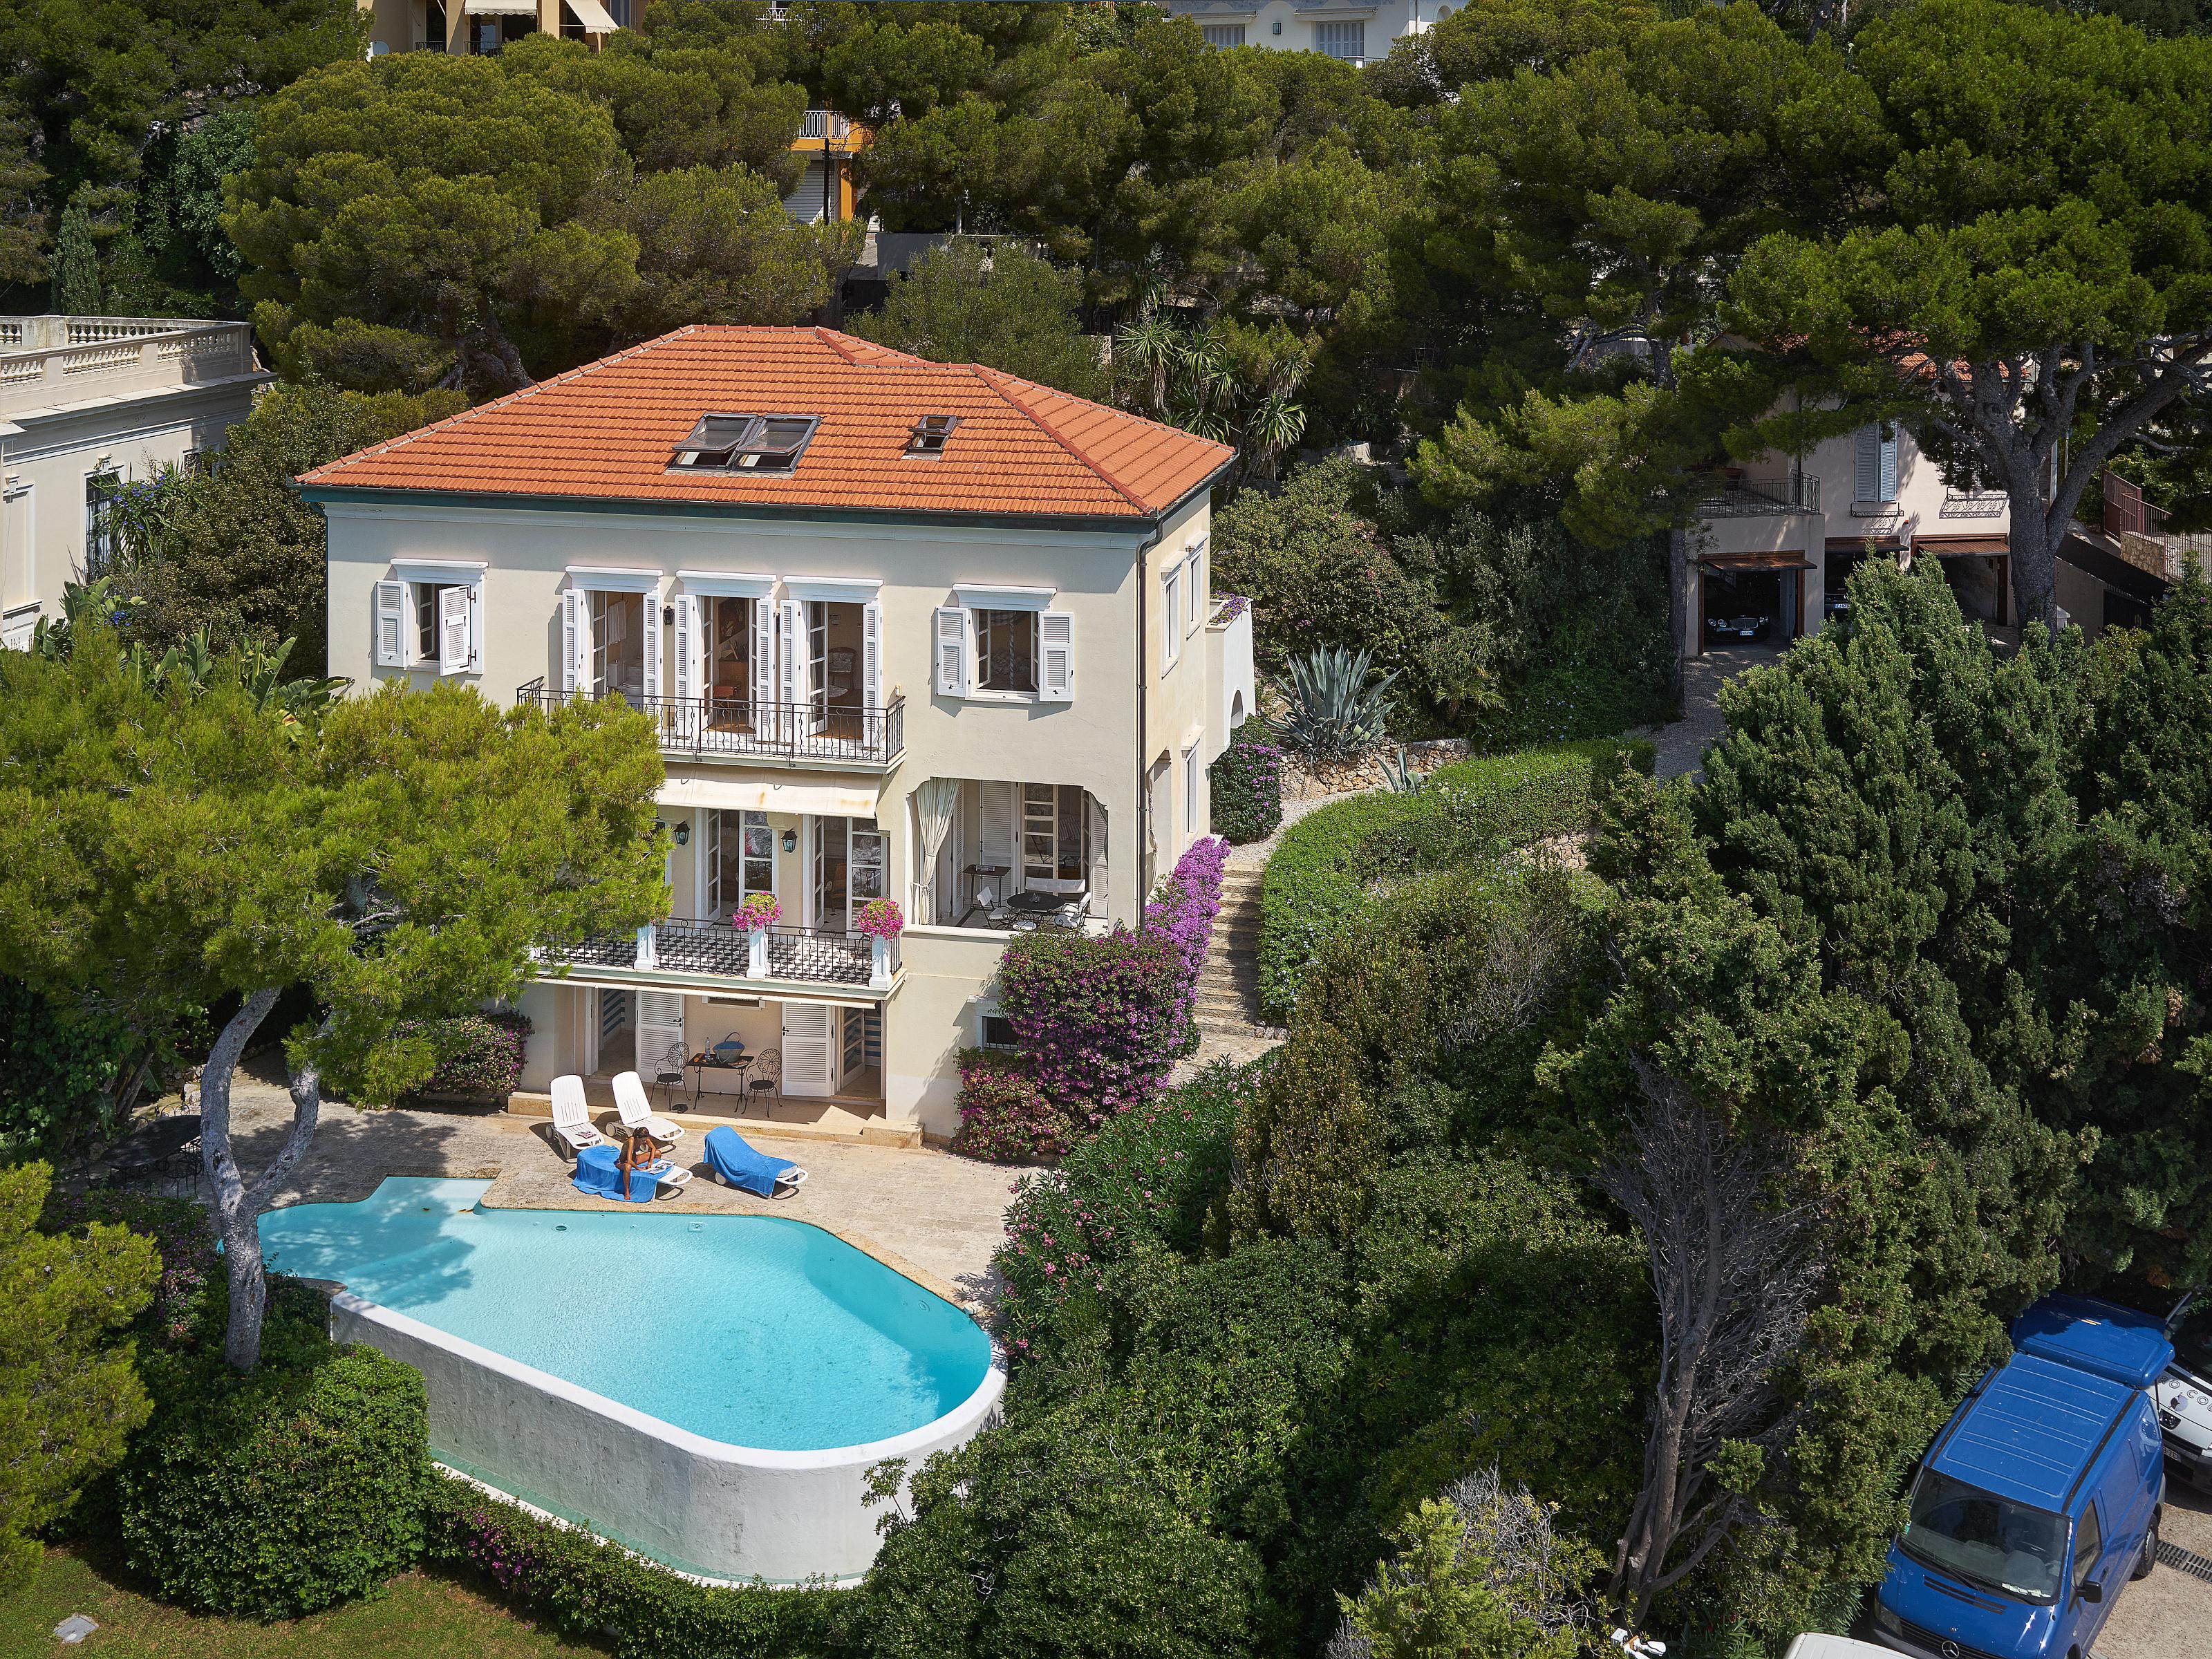 Single Family Home for Sale at Water's edge villa in Cap d'Ail Cap D'Ail, Provence-Alpes-Cote D'Azur 06320 France